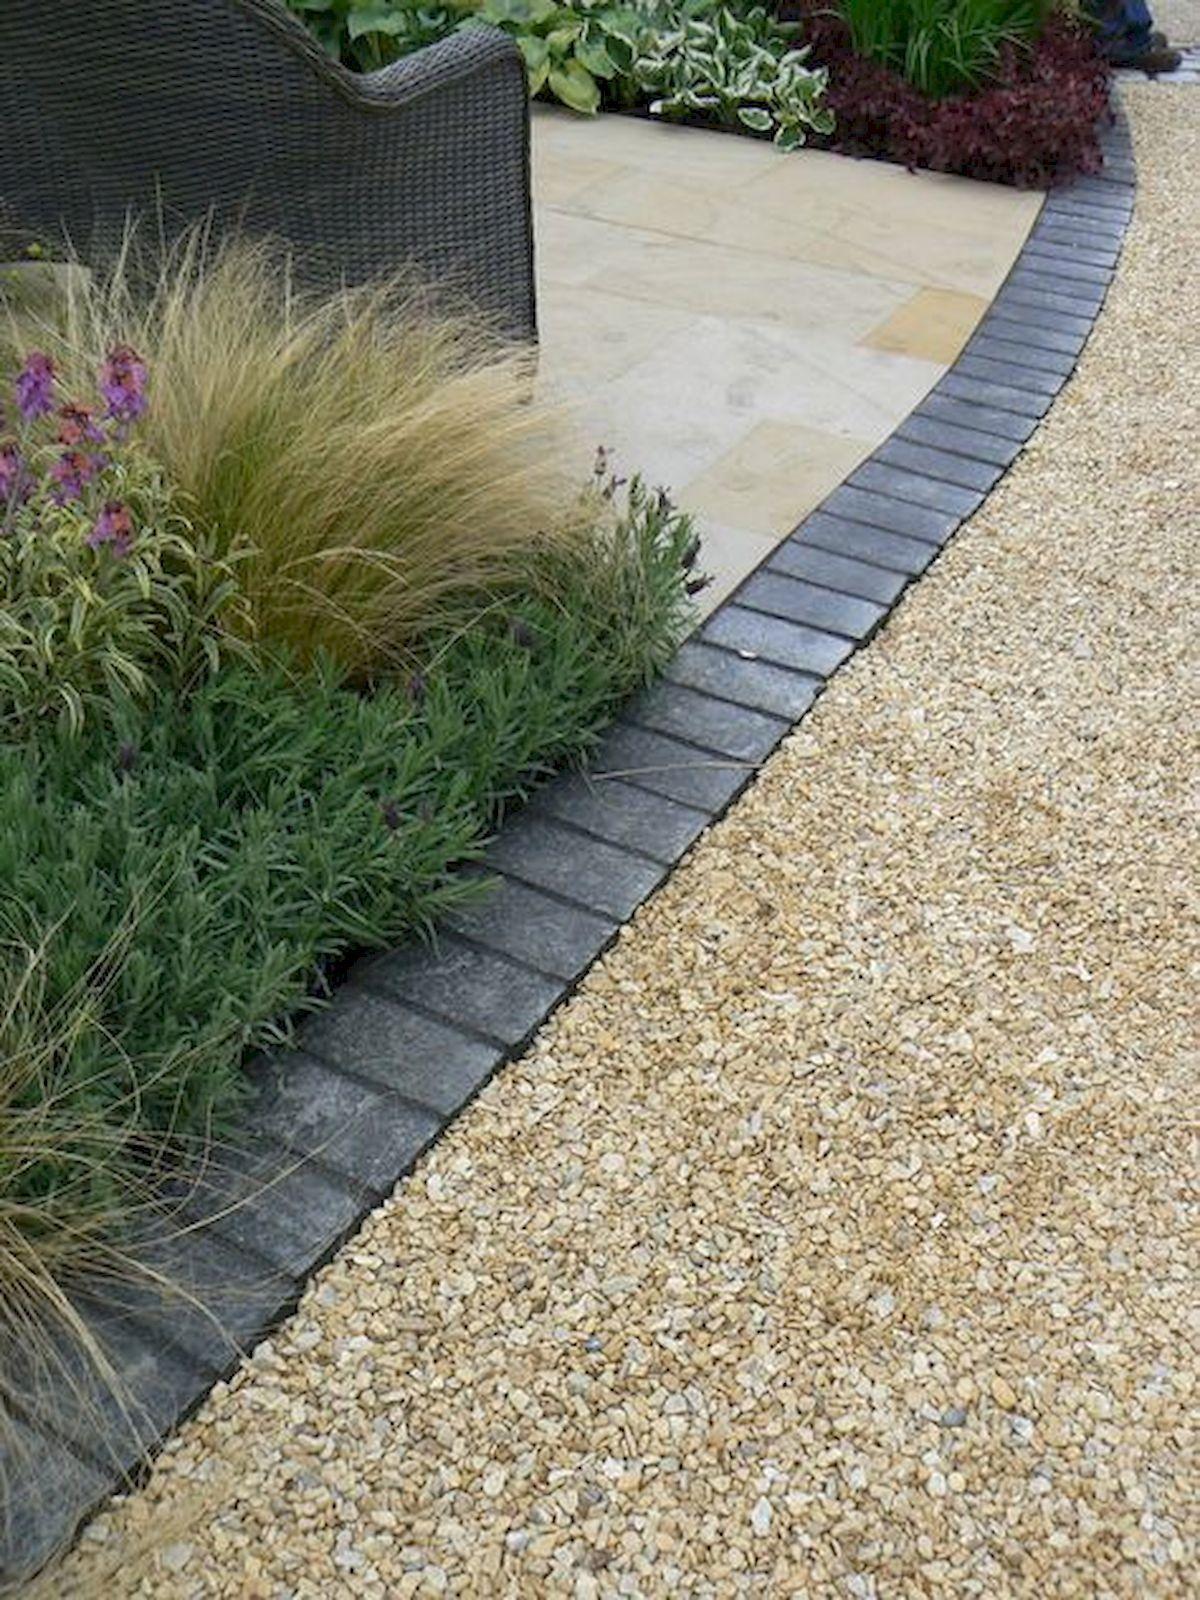 70 Magical Side Yard And Backyard Gravel Garden Design Ideas 41 Gravel Garden Driveway Landscaping Garden Paths